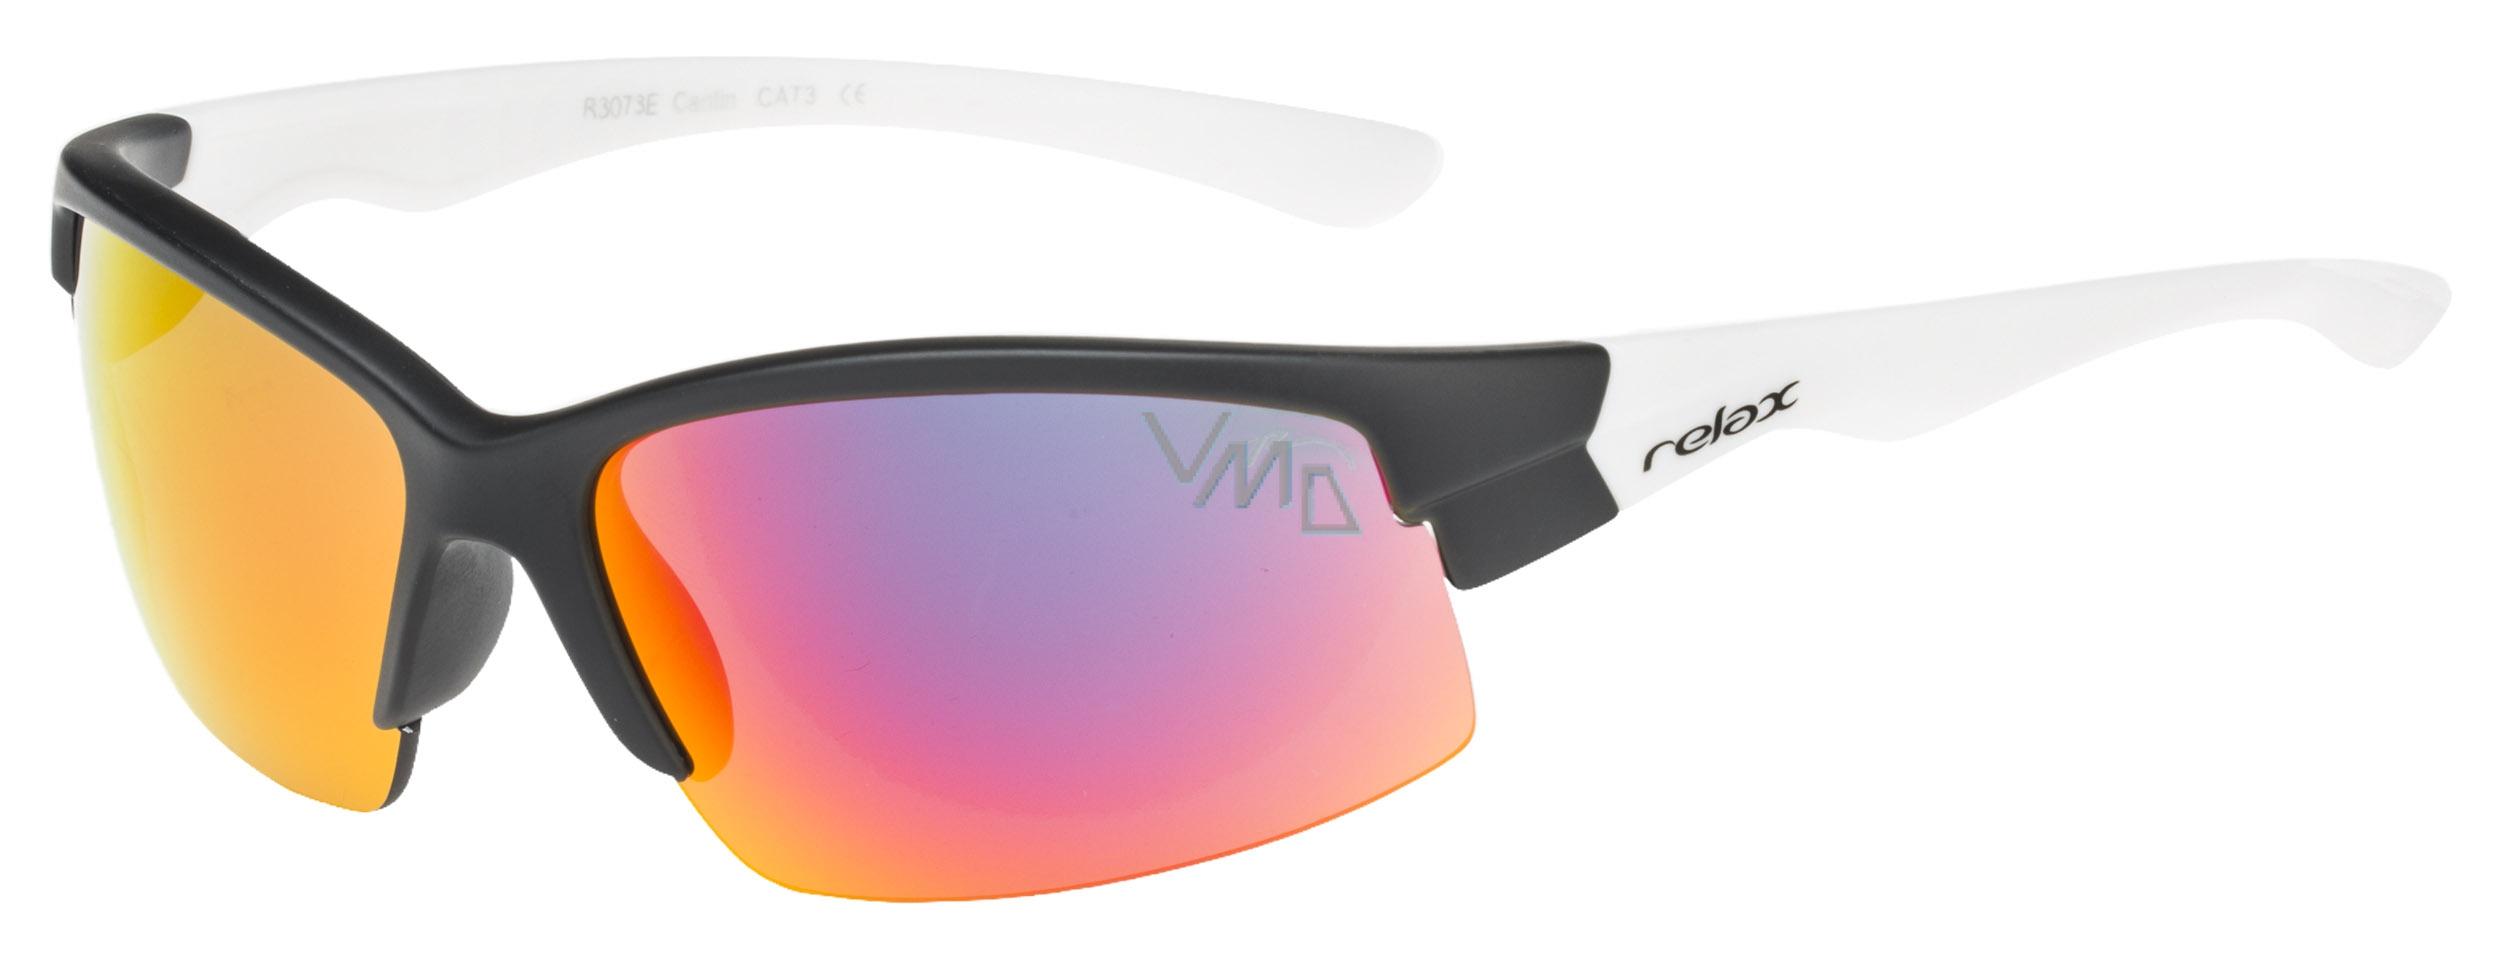 Relax children sunglasses Cantin R3073E